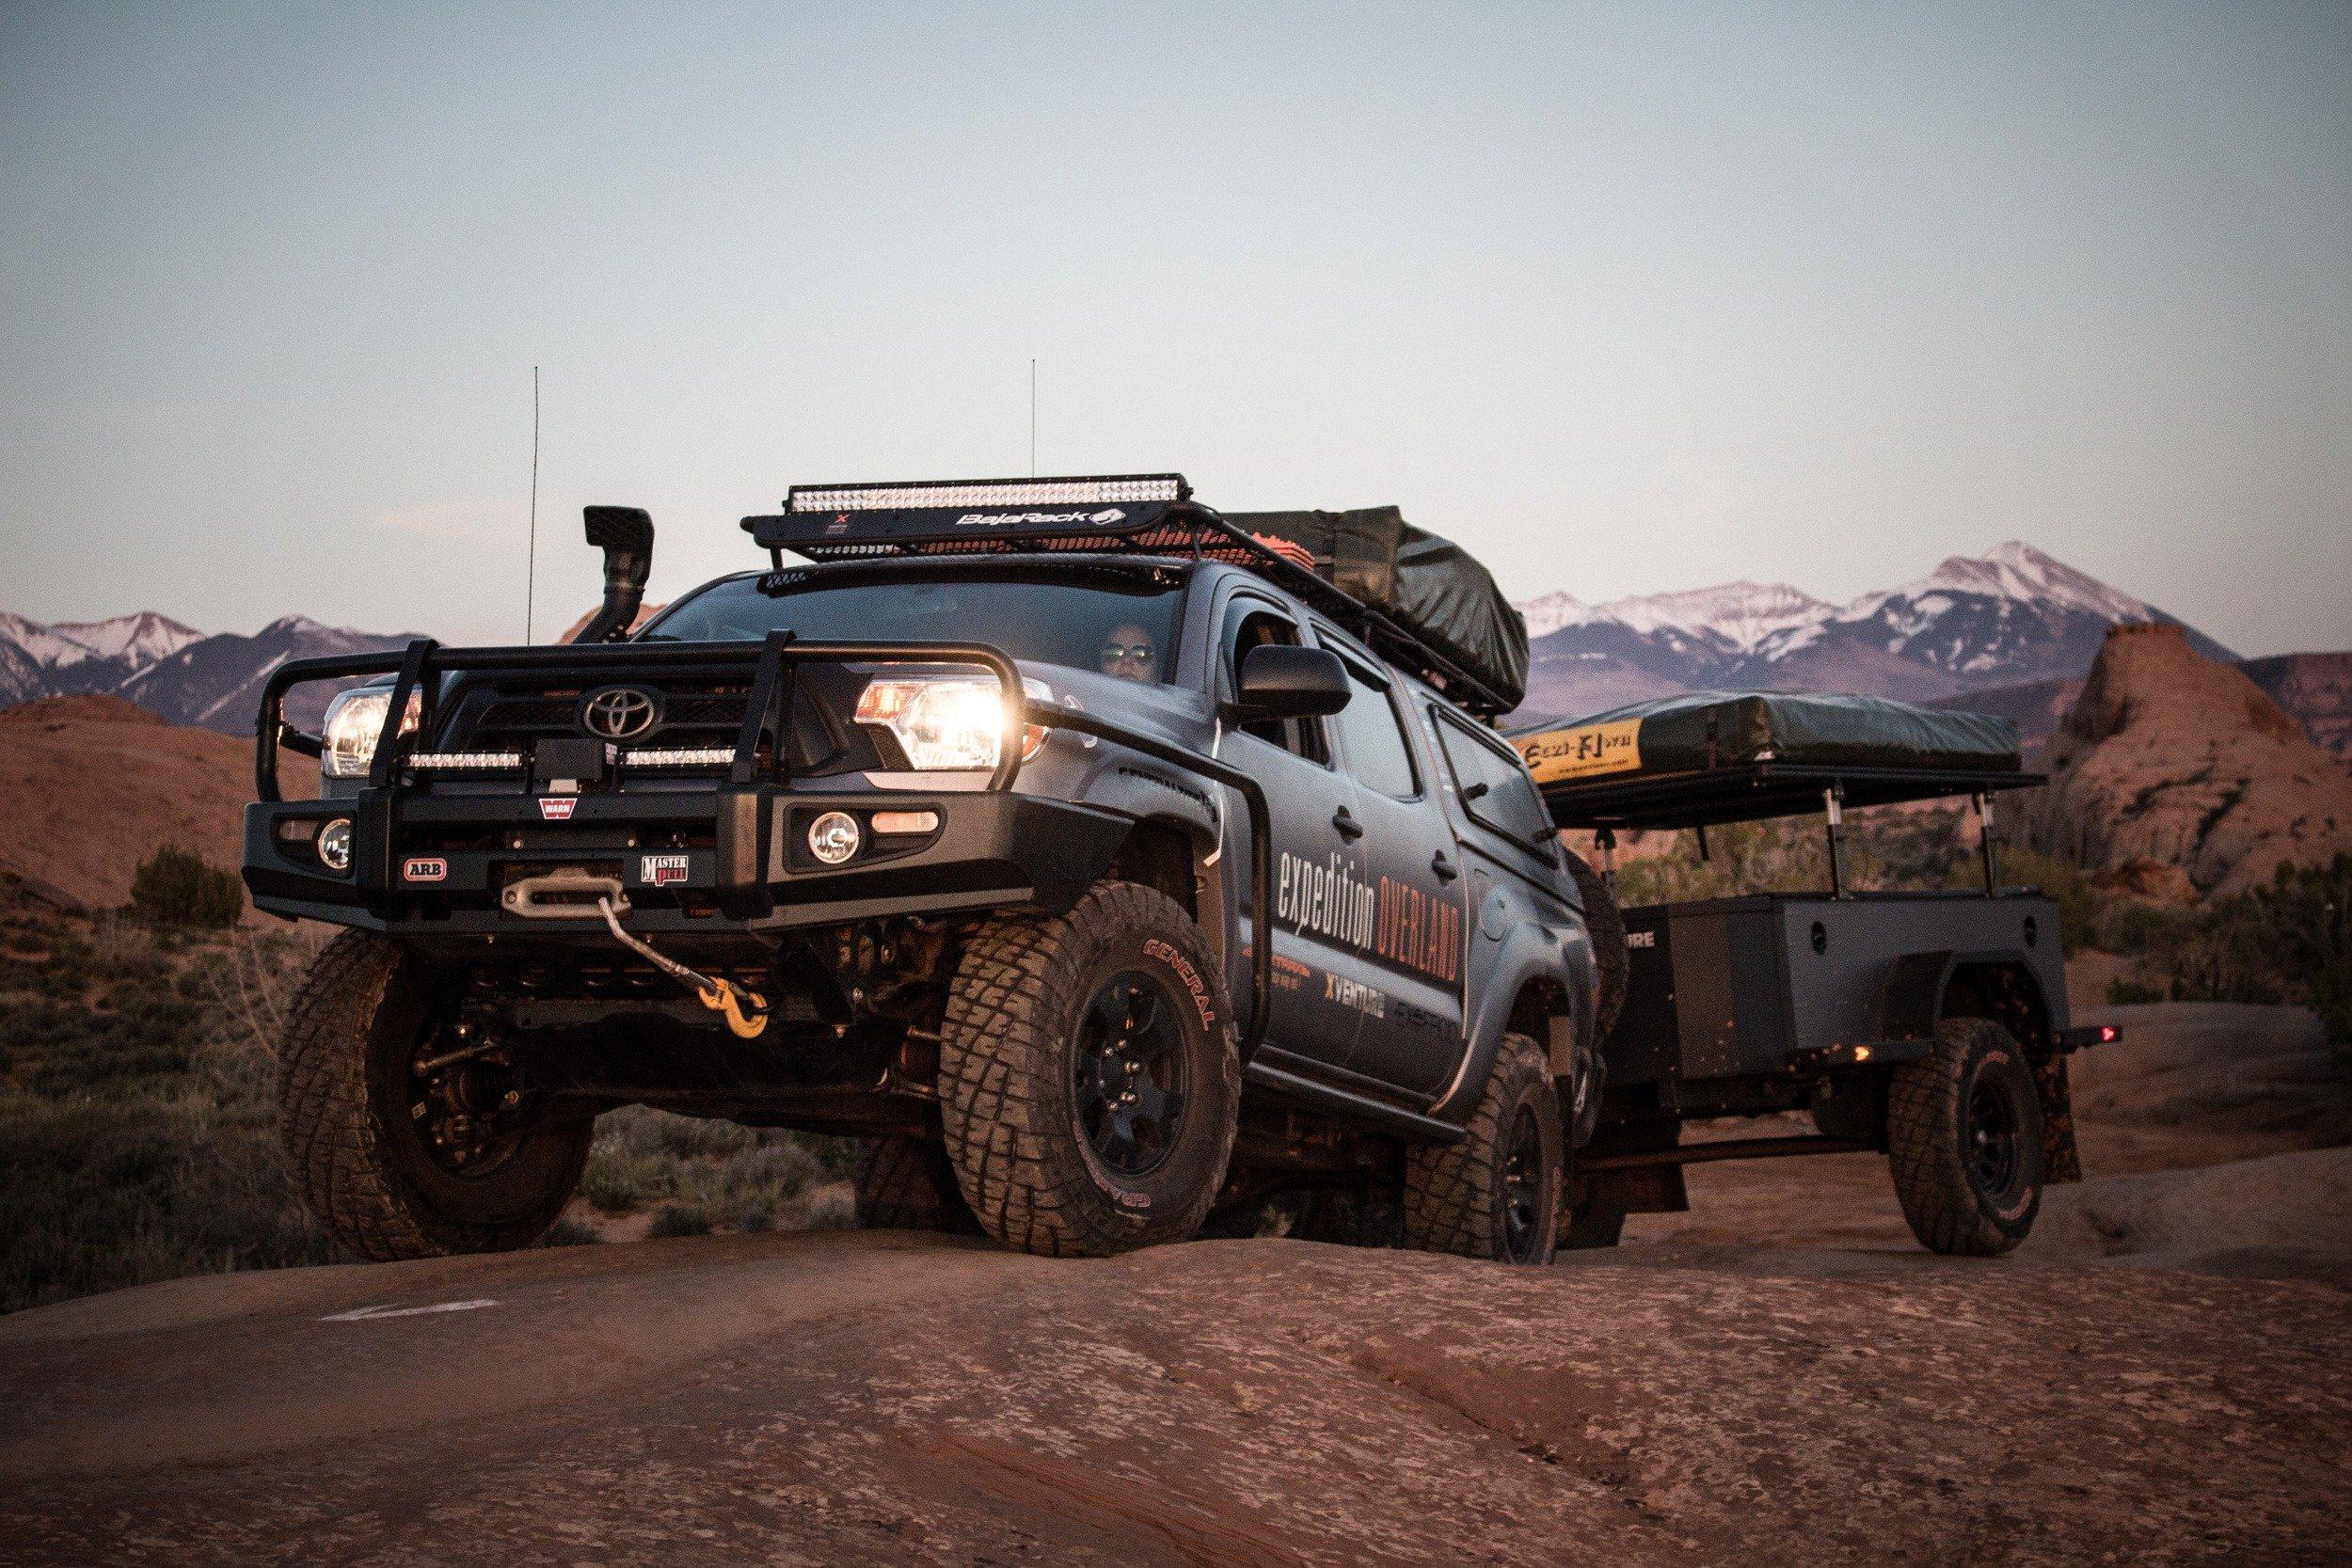 X Venture trailer by Schutt Industries - Expedition Overland